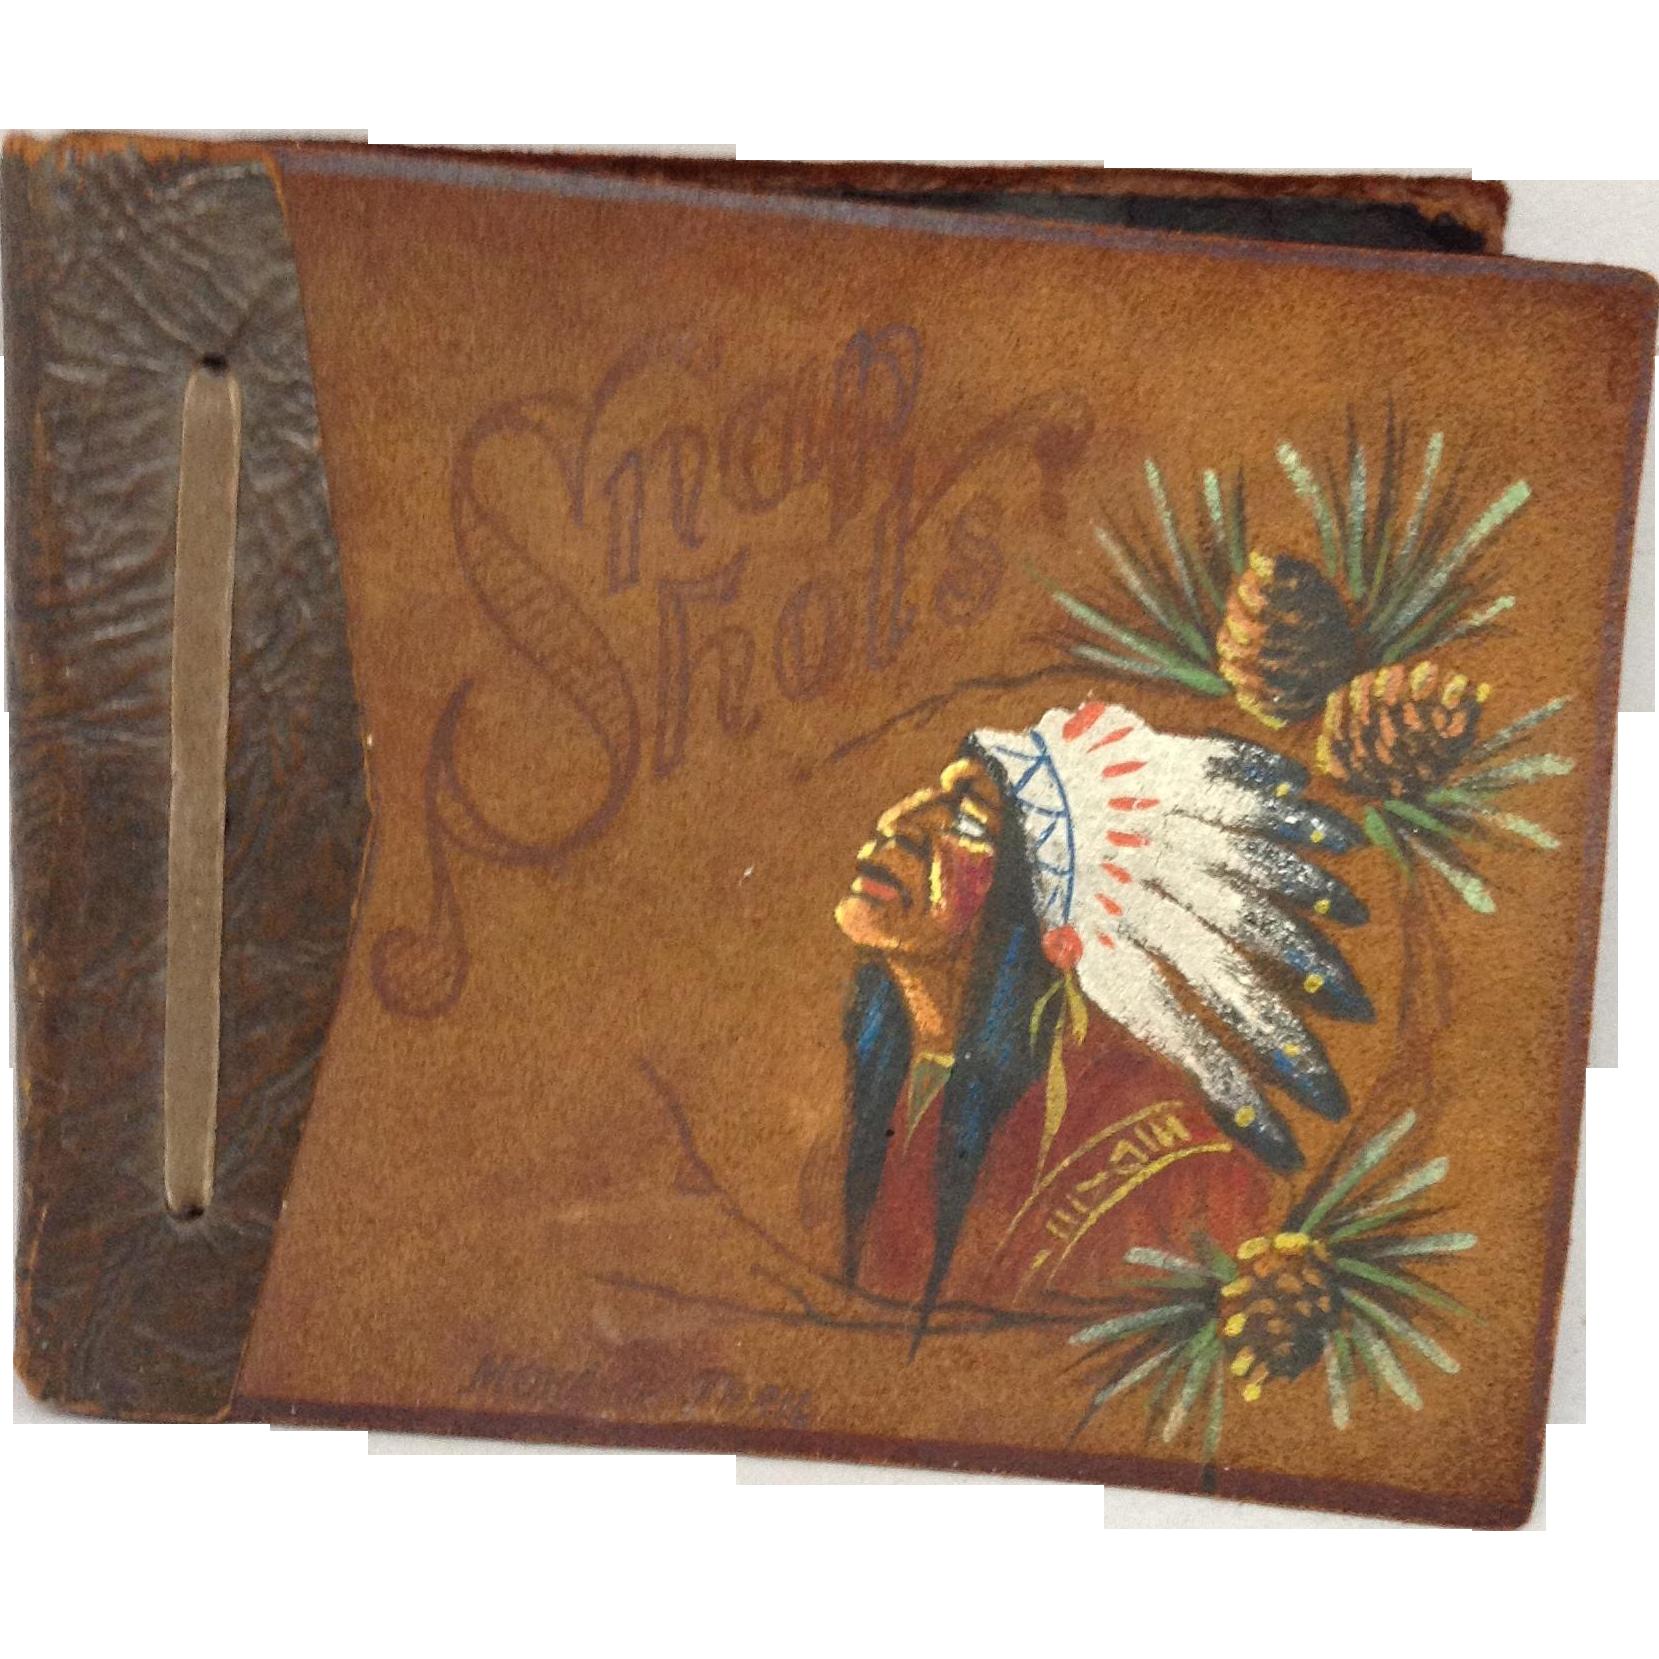 Leather Scrapbook Indian Design 1930's